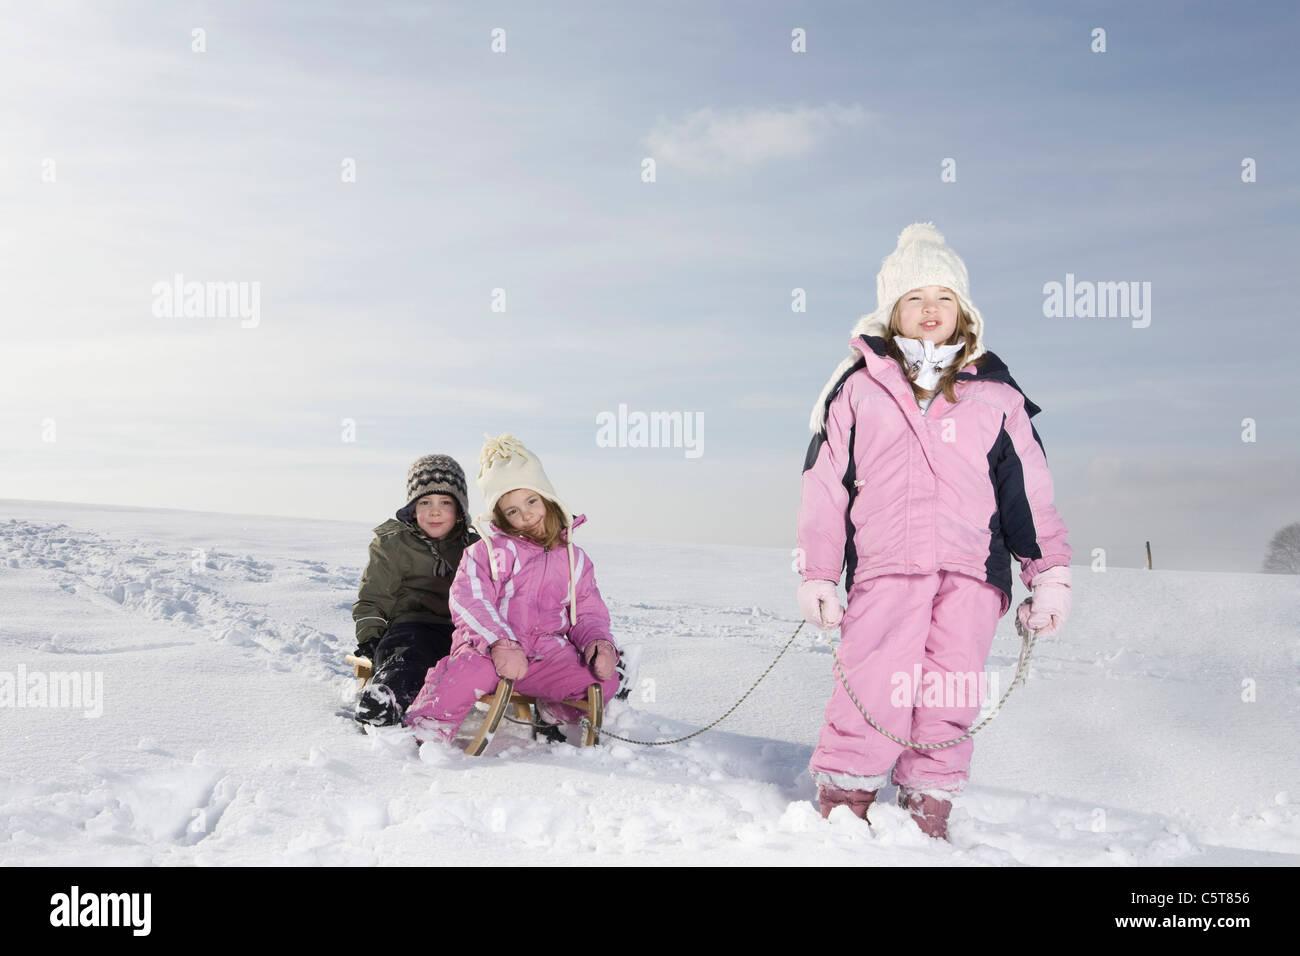 Germany, Bavaria, Munich, Girl (8-9) pulling sledge, portrait - Stock Image